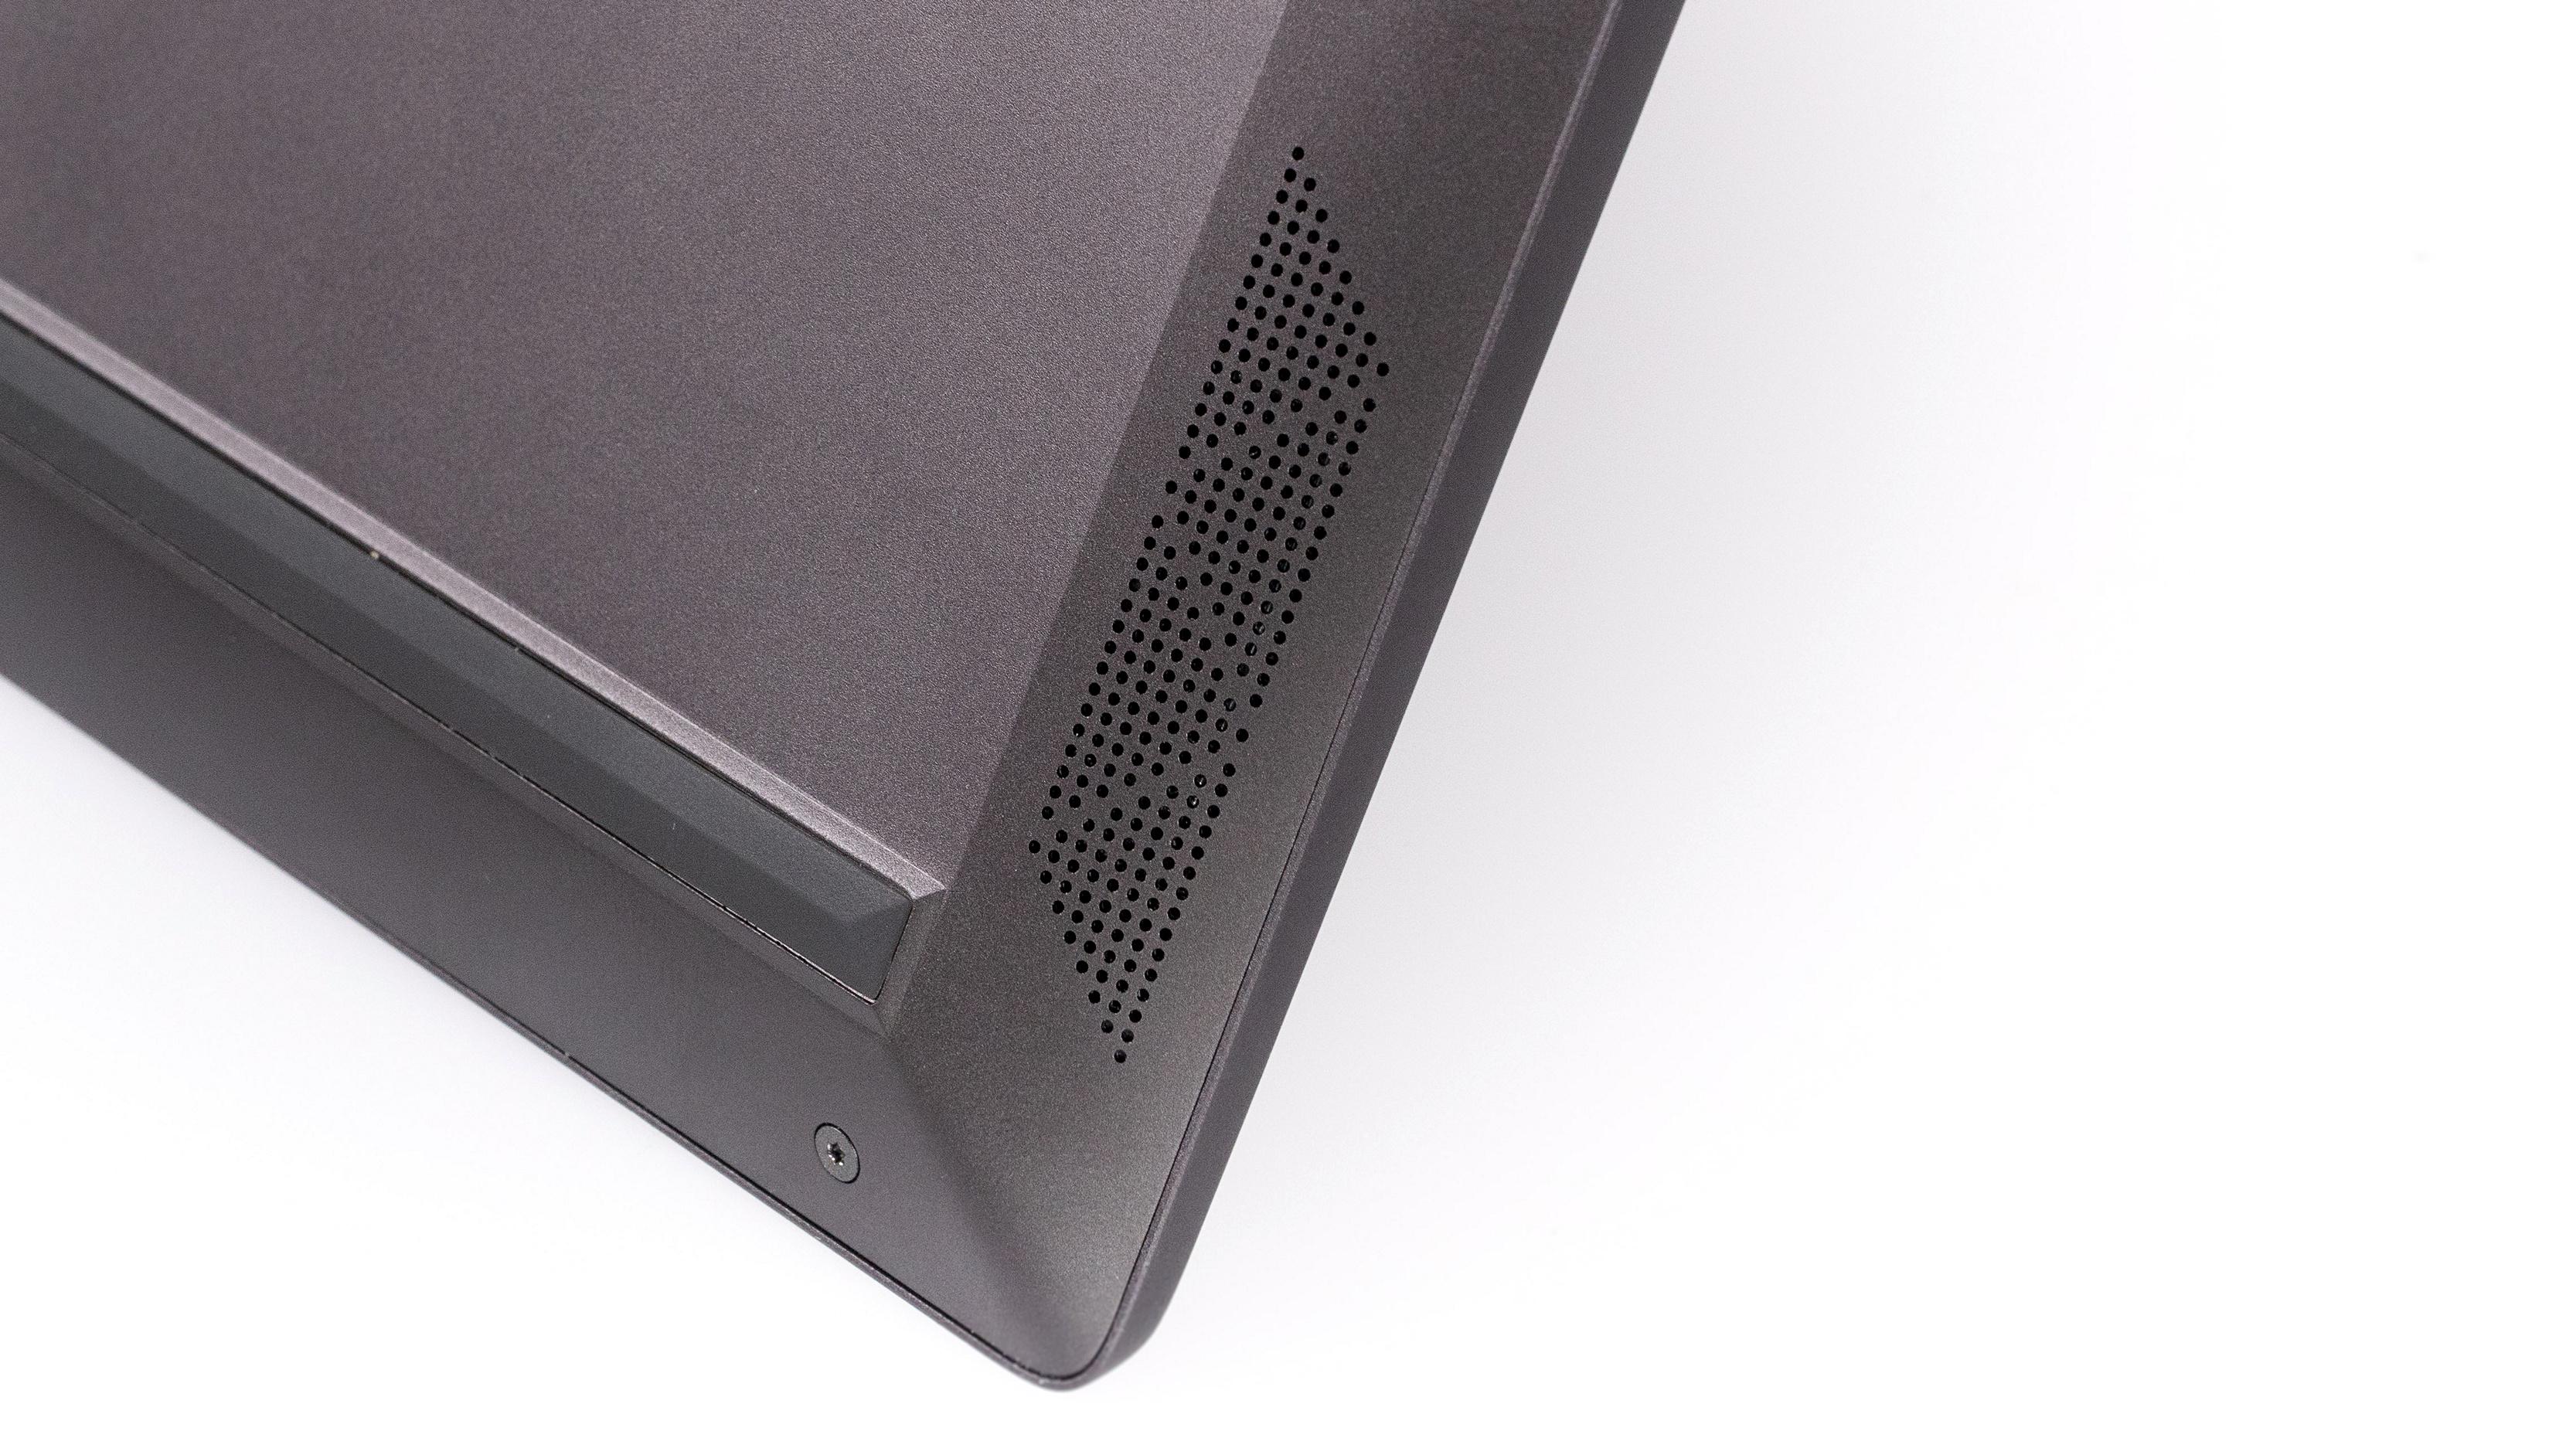 HP Envy 13 x360 im Test: Ryzen-Convertible leuchtet hell und hässlich - HP Envy 13 x360 (Bild: Marc Sauter/Golem.de)